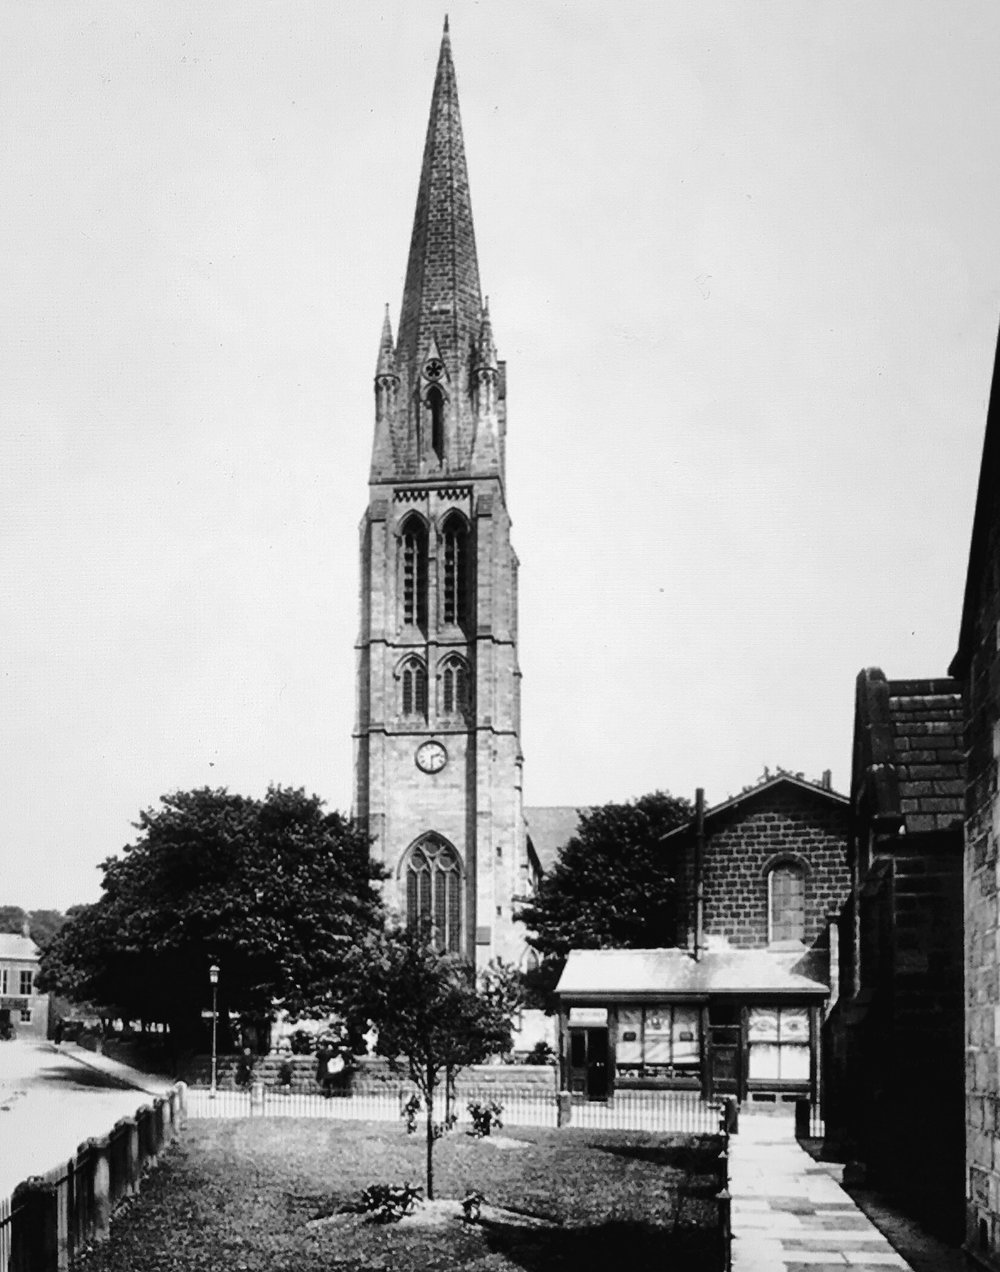 St Michael's Church and Green, circa 1897